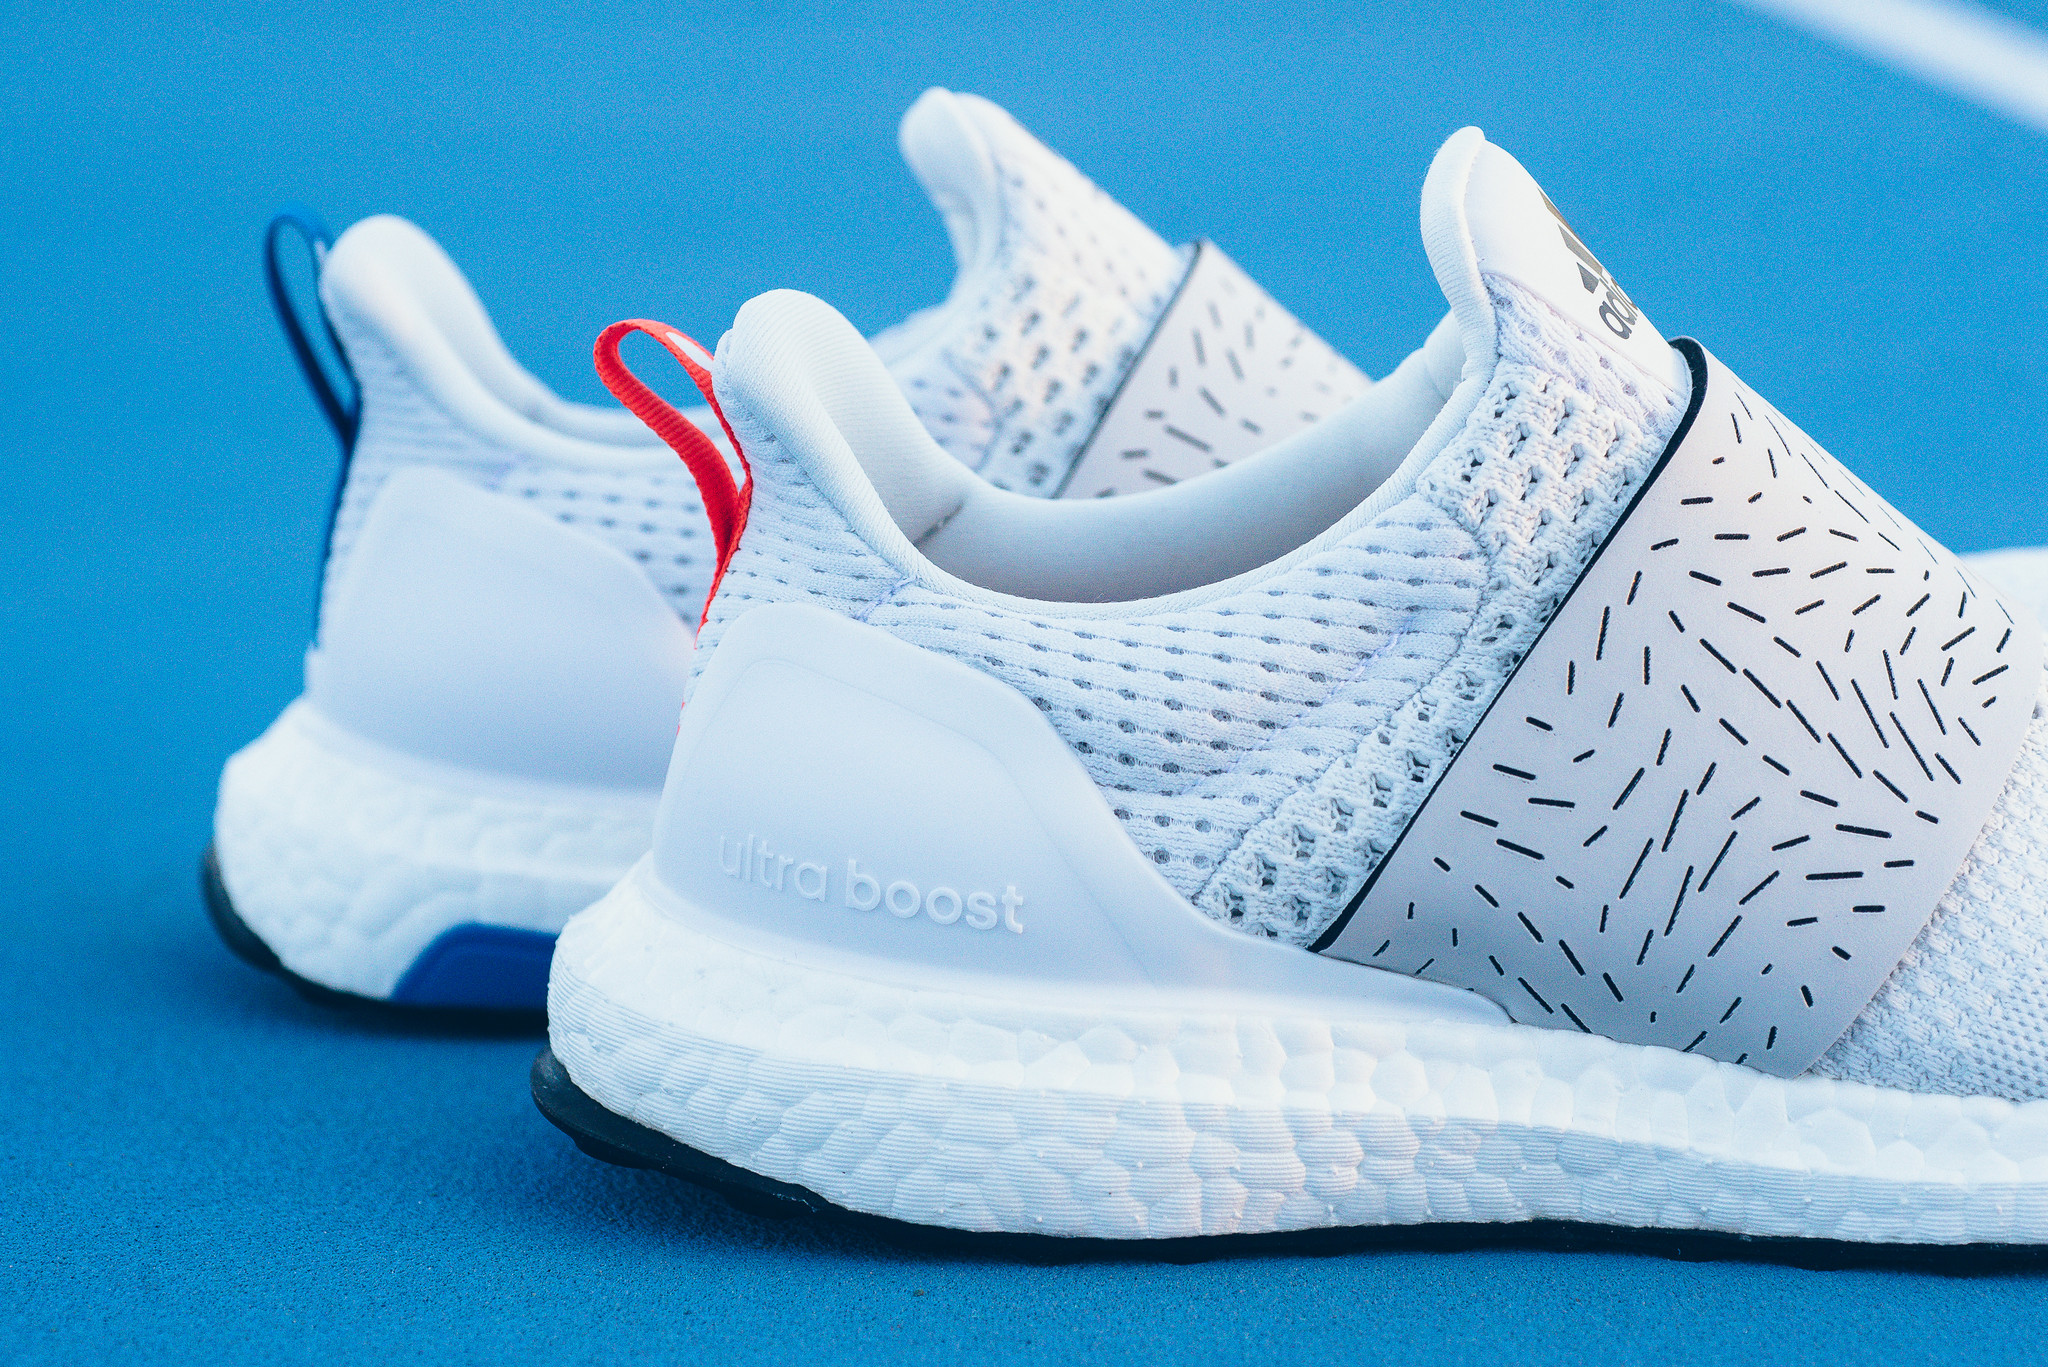 Adidas_x_Wood_Wood_Ultra_Boost_Smealer_Politics_Hypebeast_8